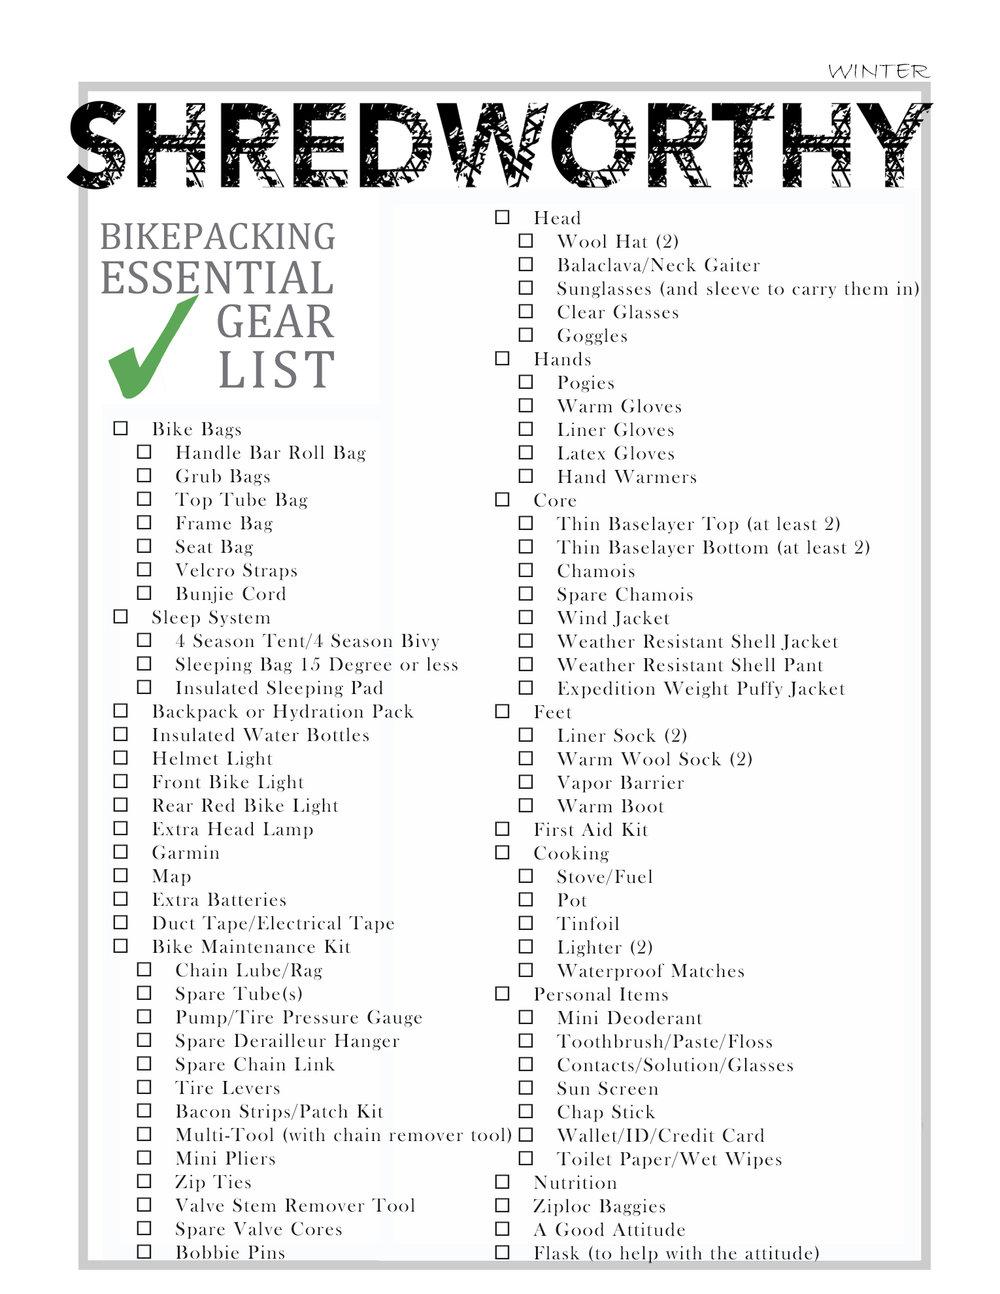 Essential Winter Gear List.jpg